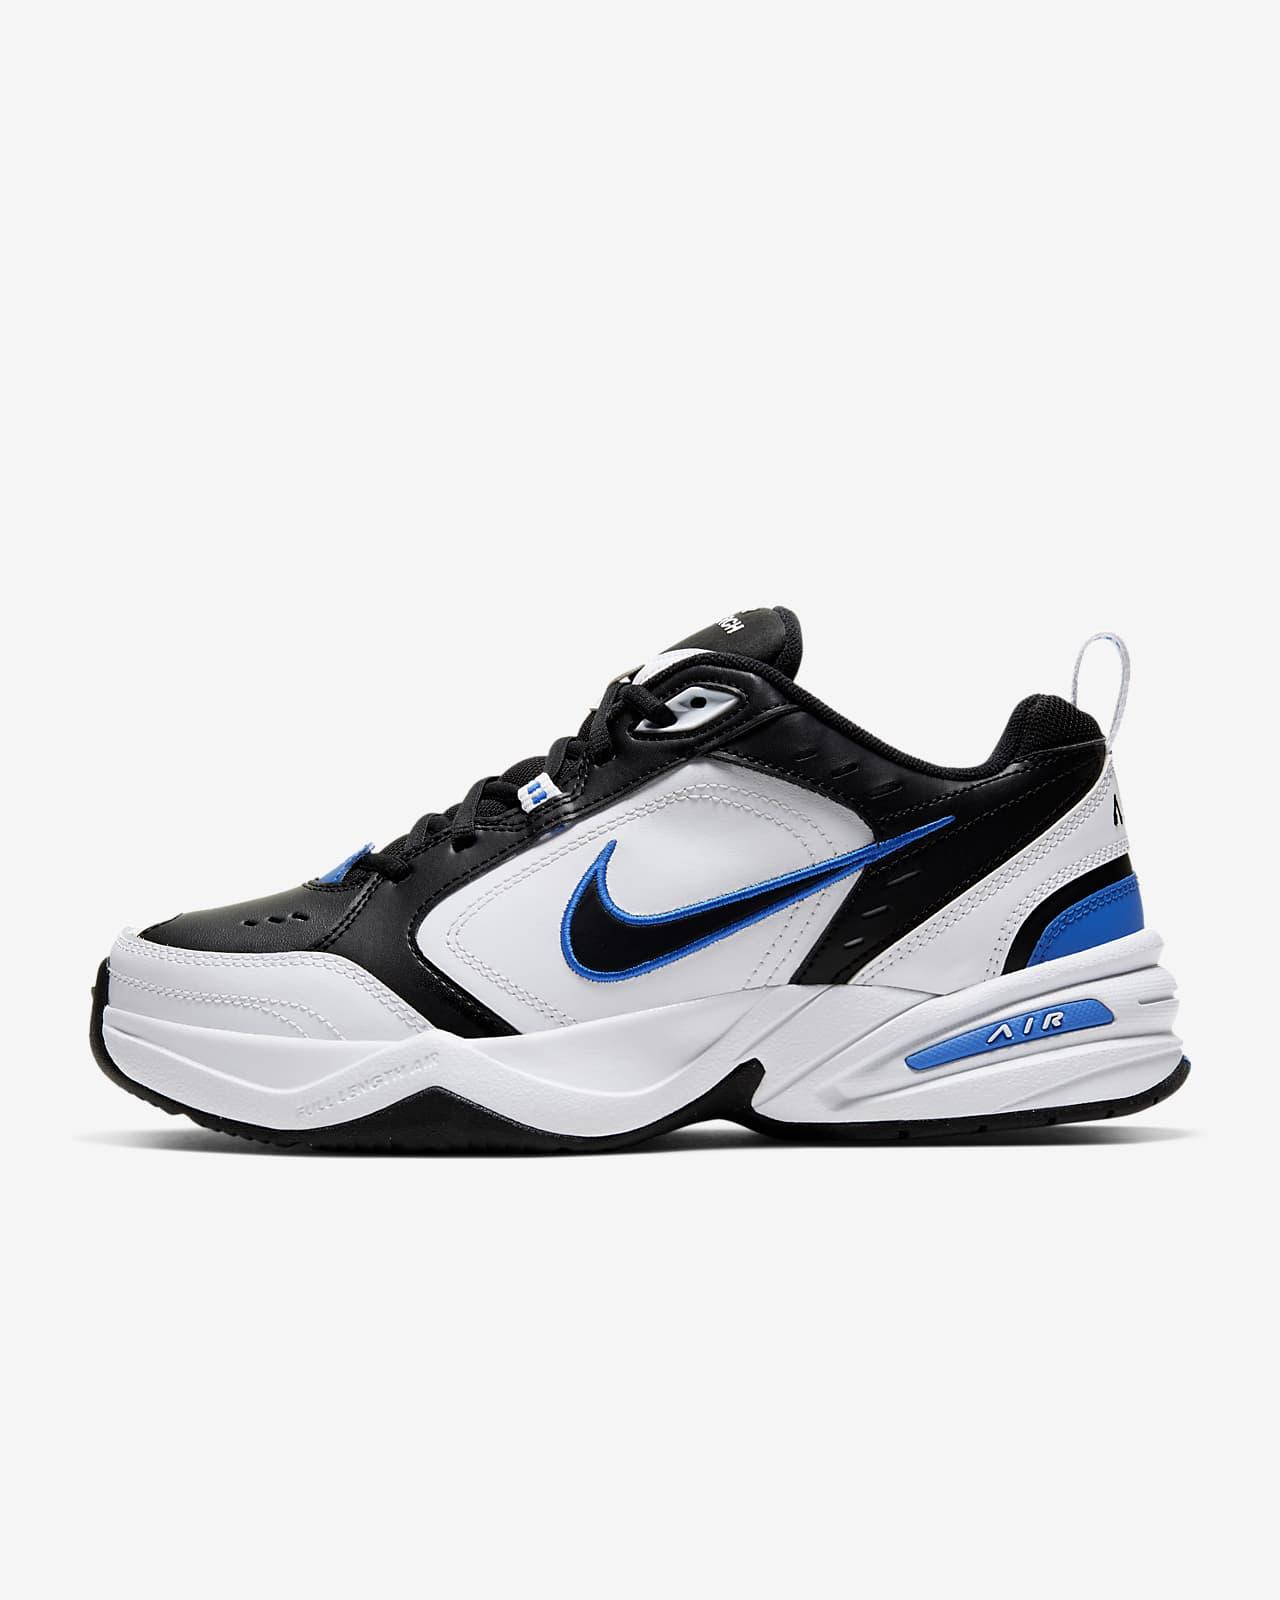 libertad mundo Juicio  Nike Air Monarch IV Men's Training Shoe. Nike ID